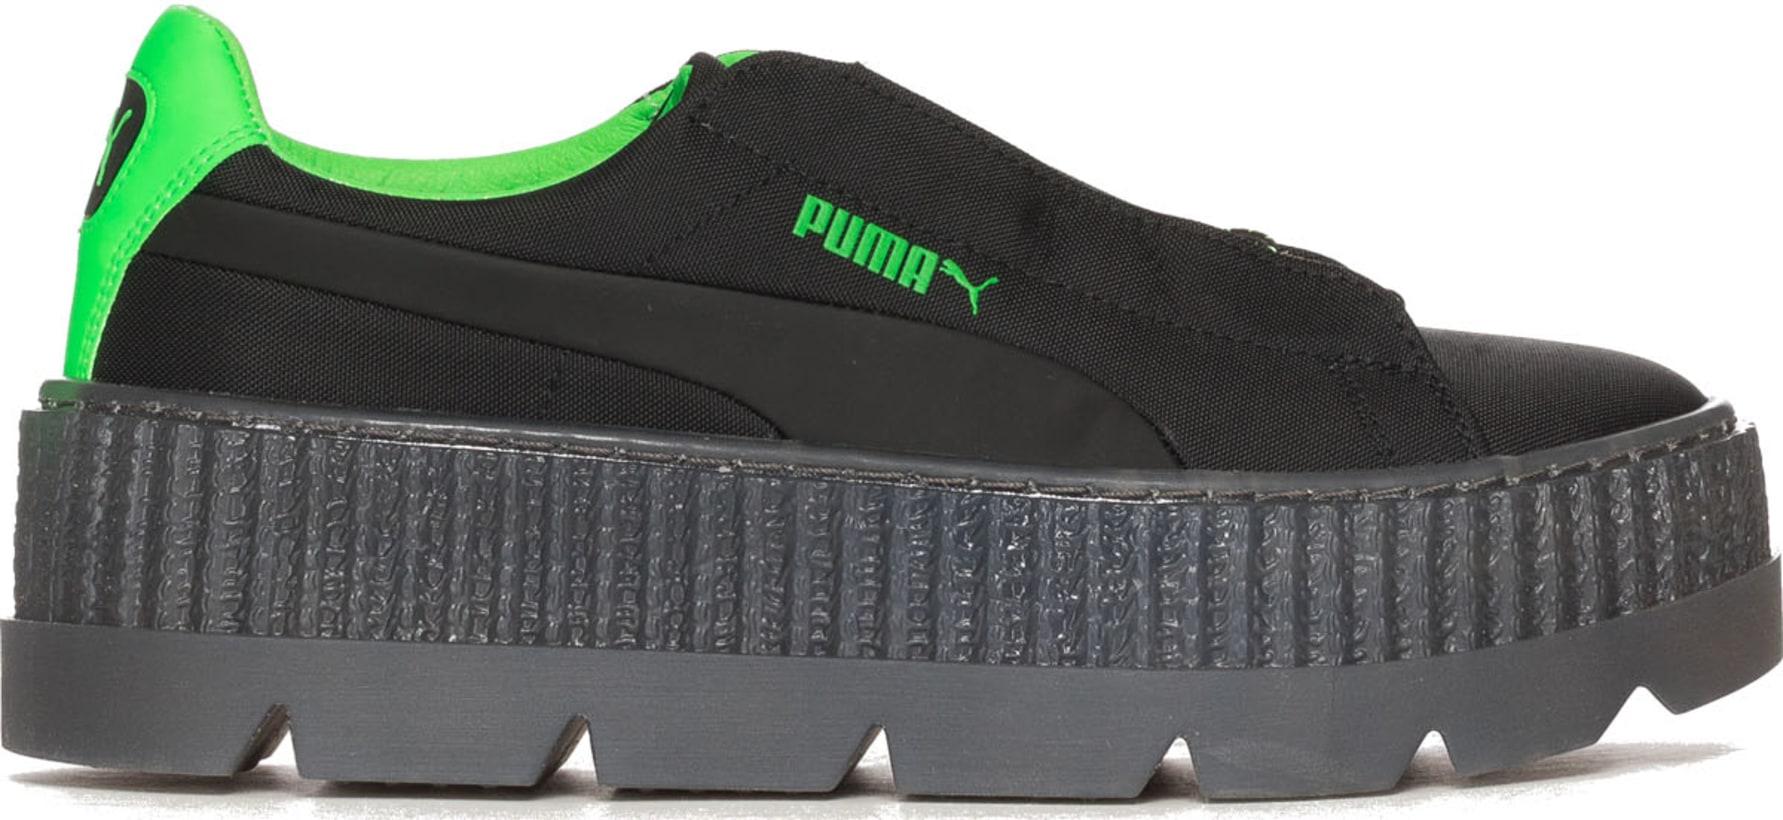 wholesale dealer 8f94c 4d232 Puma - Fenty Cleated Creeper Surf - Black/Green Gecko